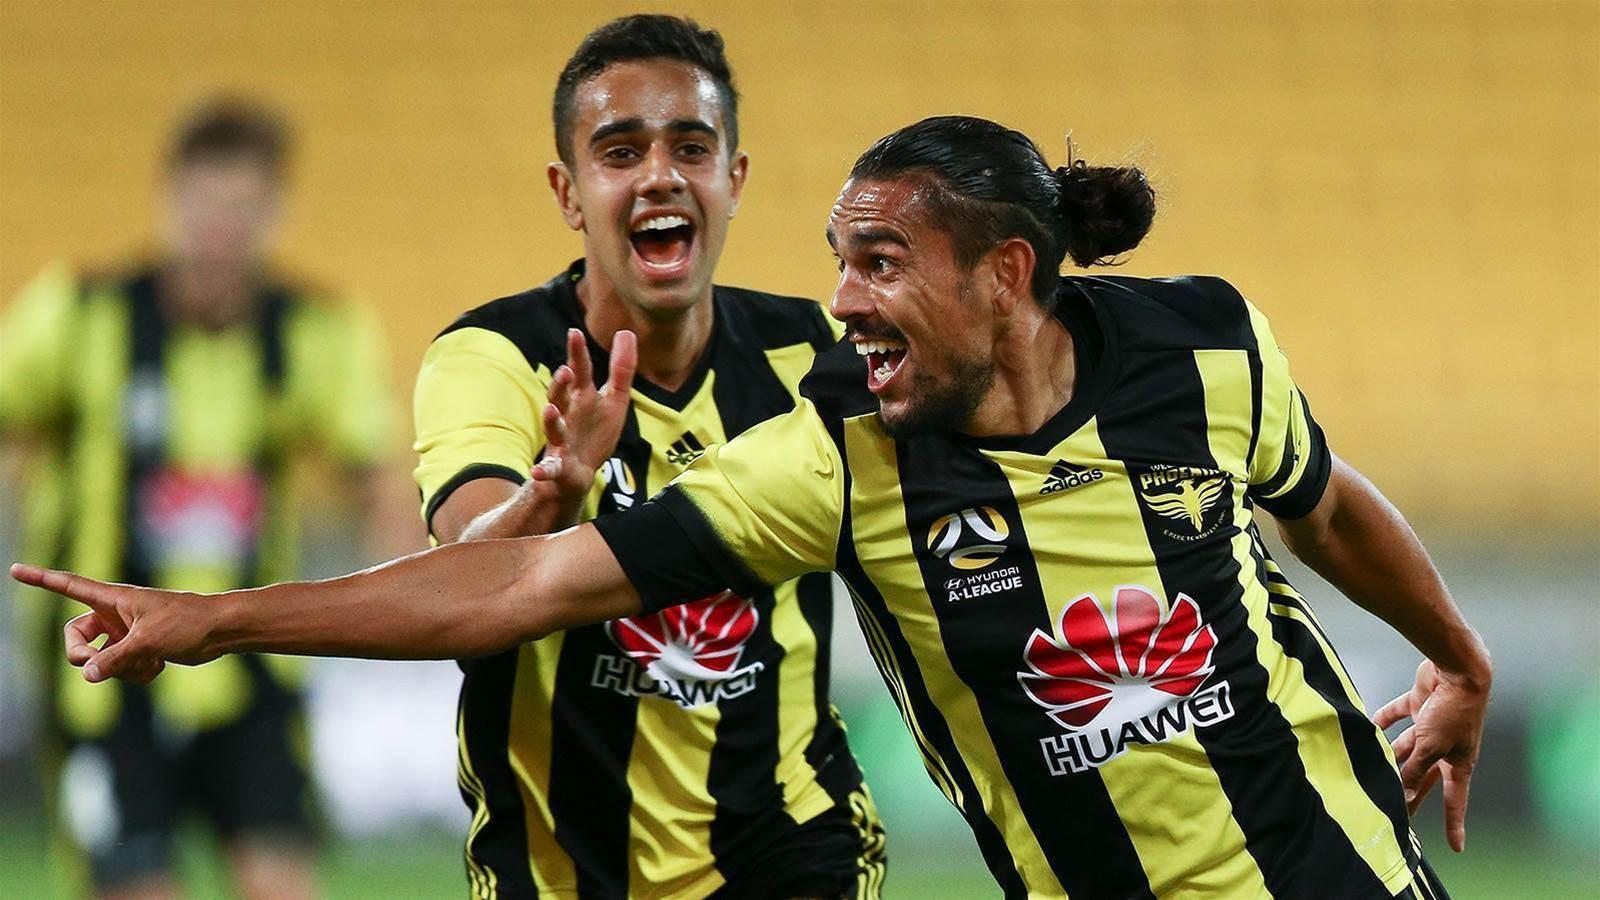 Wellington Phoenix 4 vs Brisbane Roar 1: Player Ratings